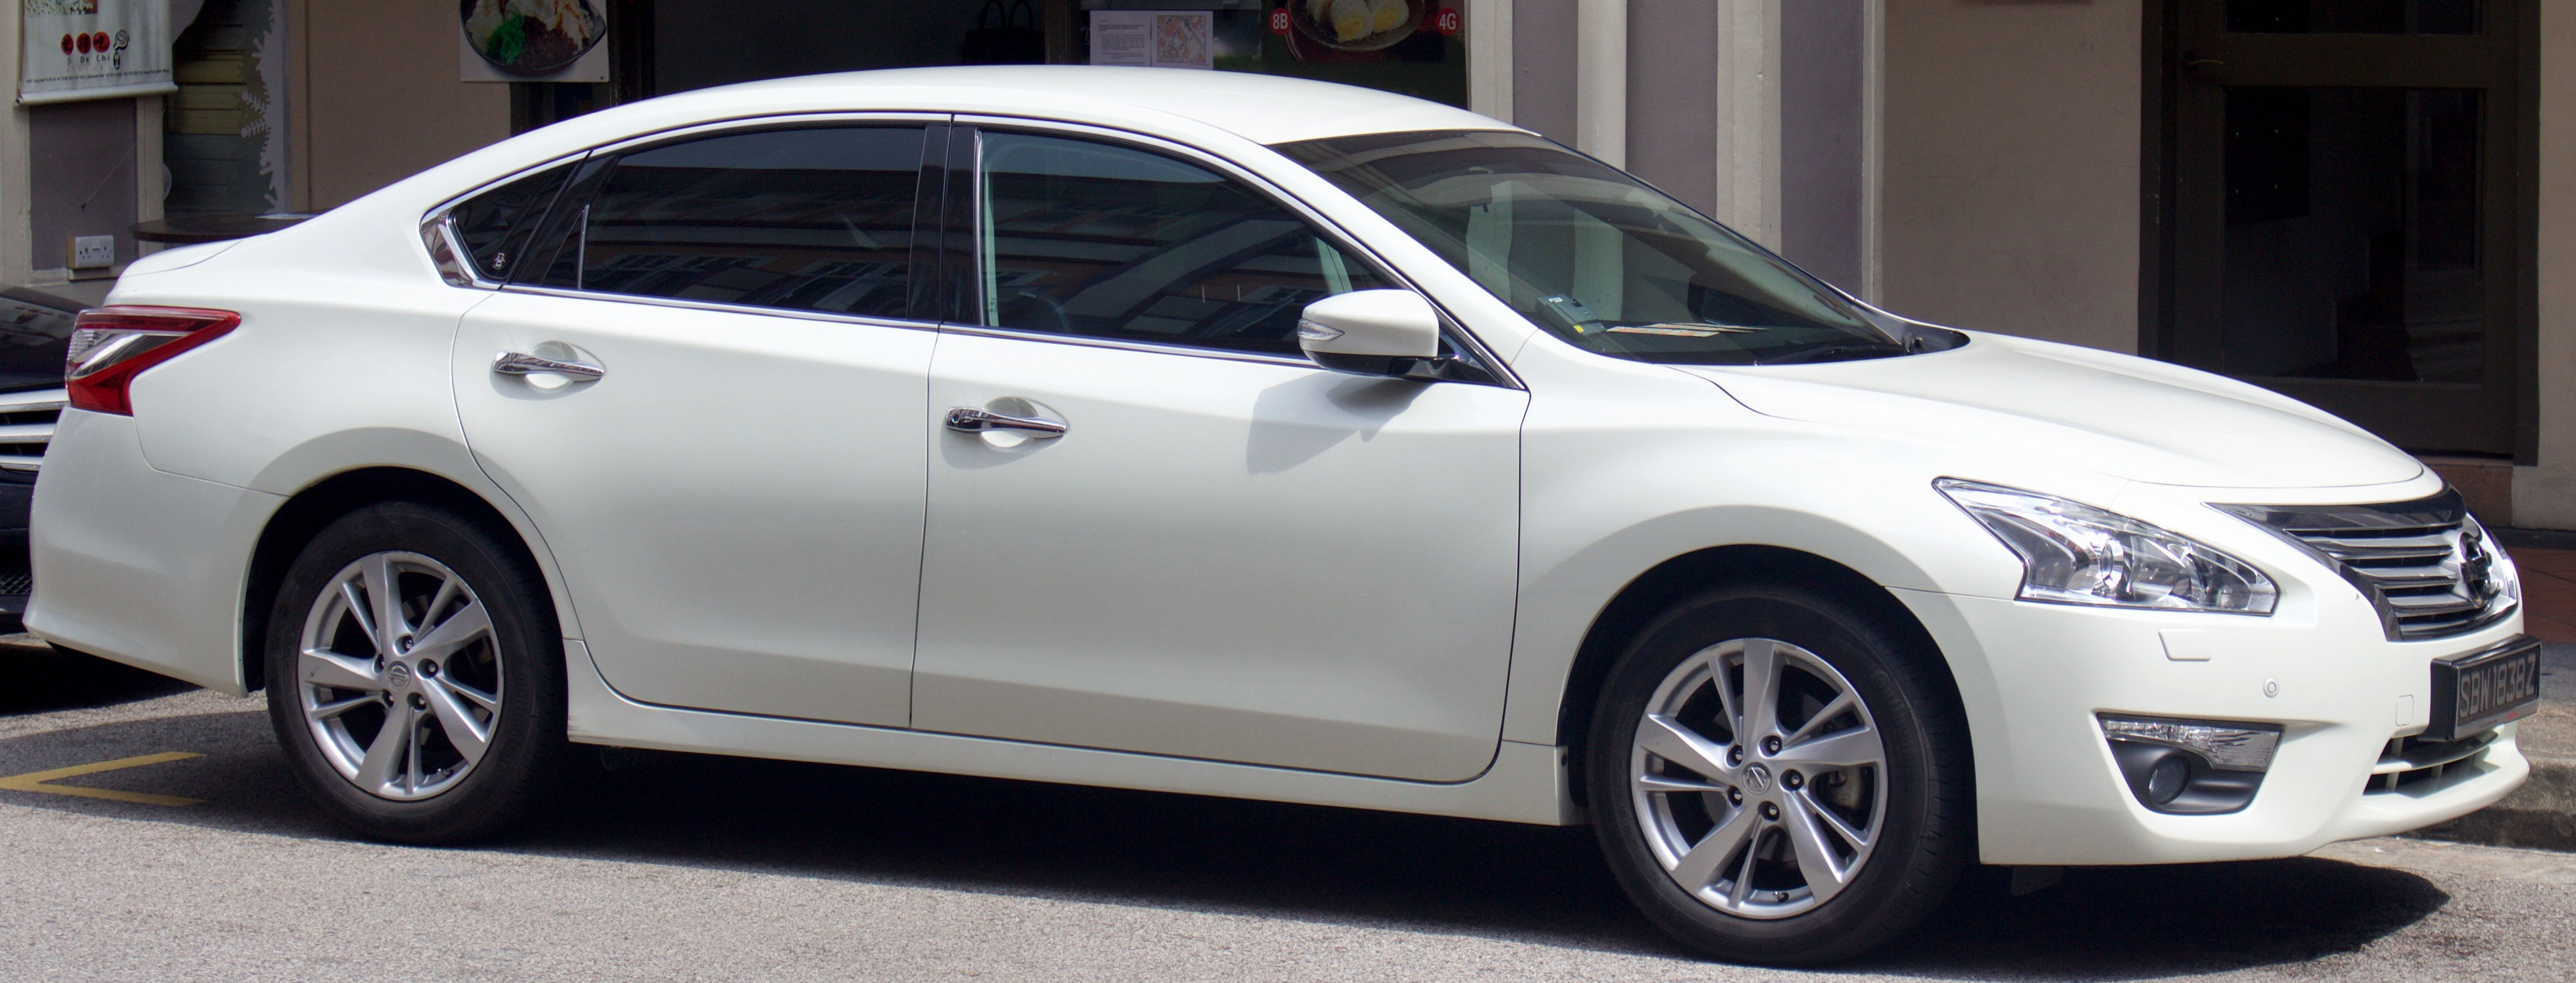 Nissan Teana II Restyling 2011 - 2014 Sedan #2